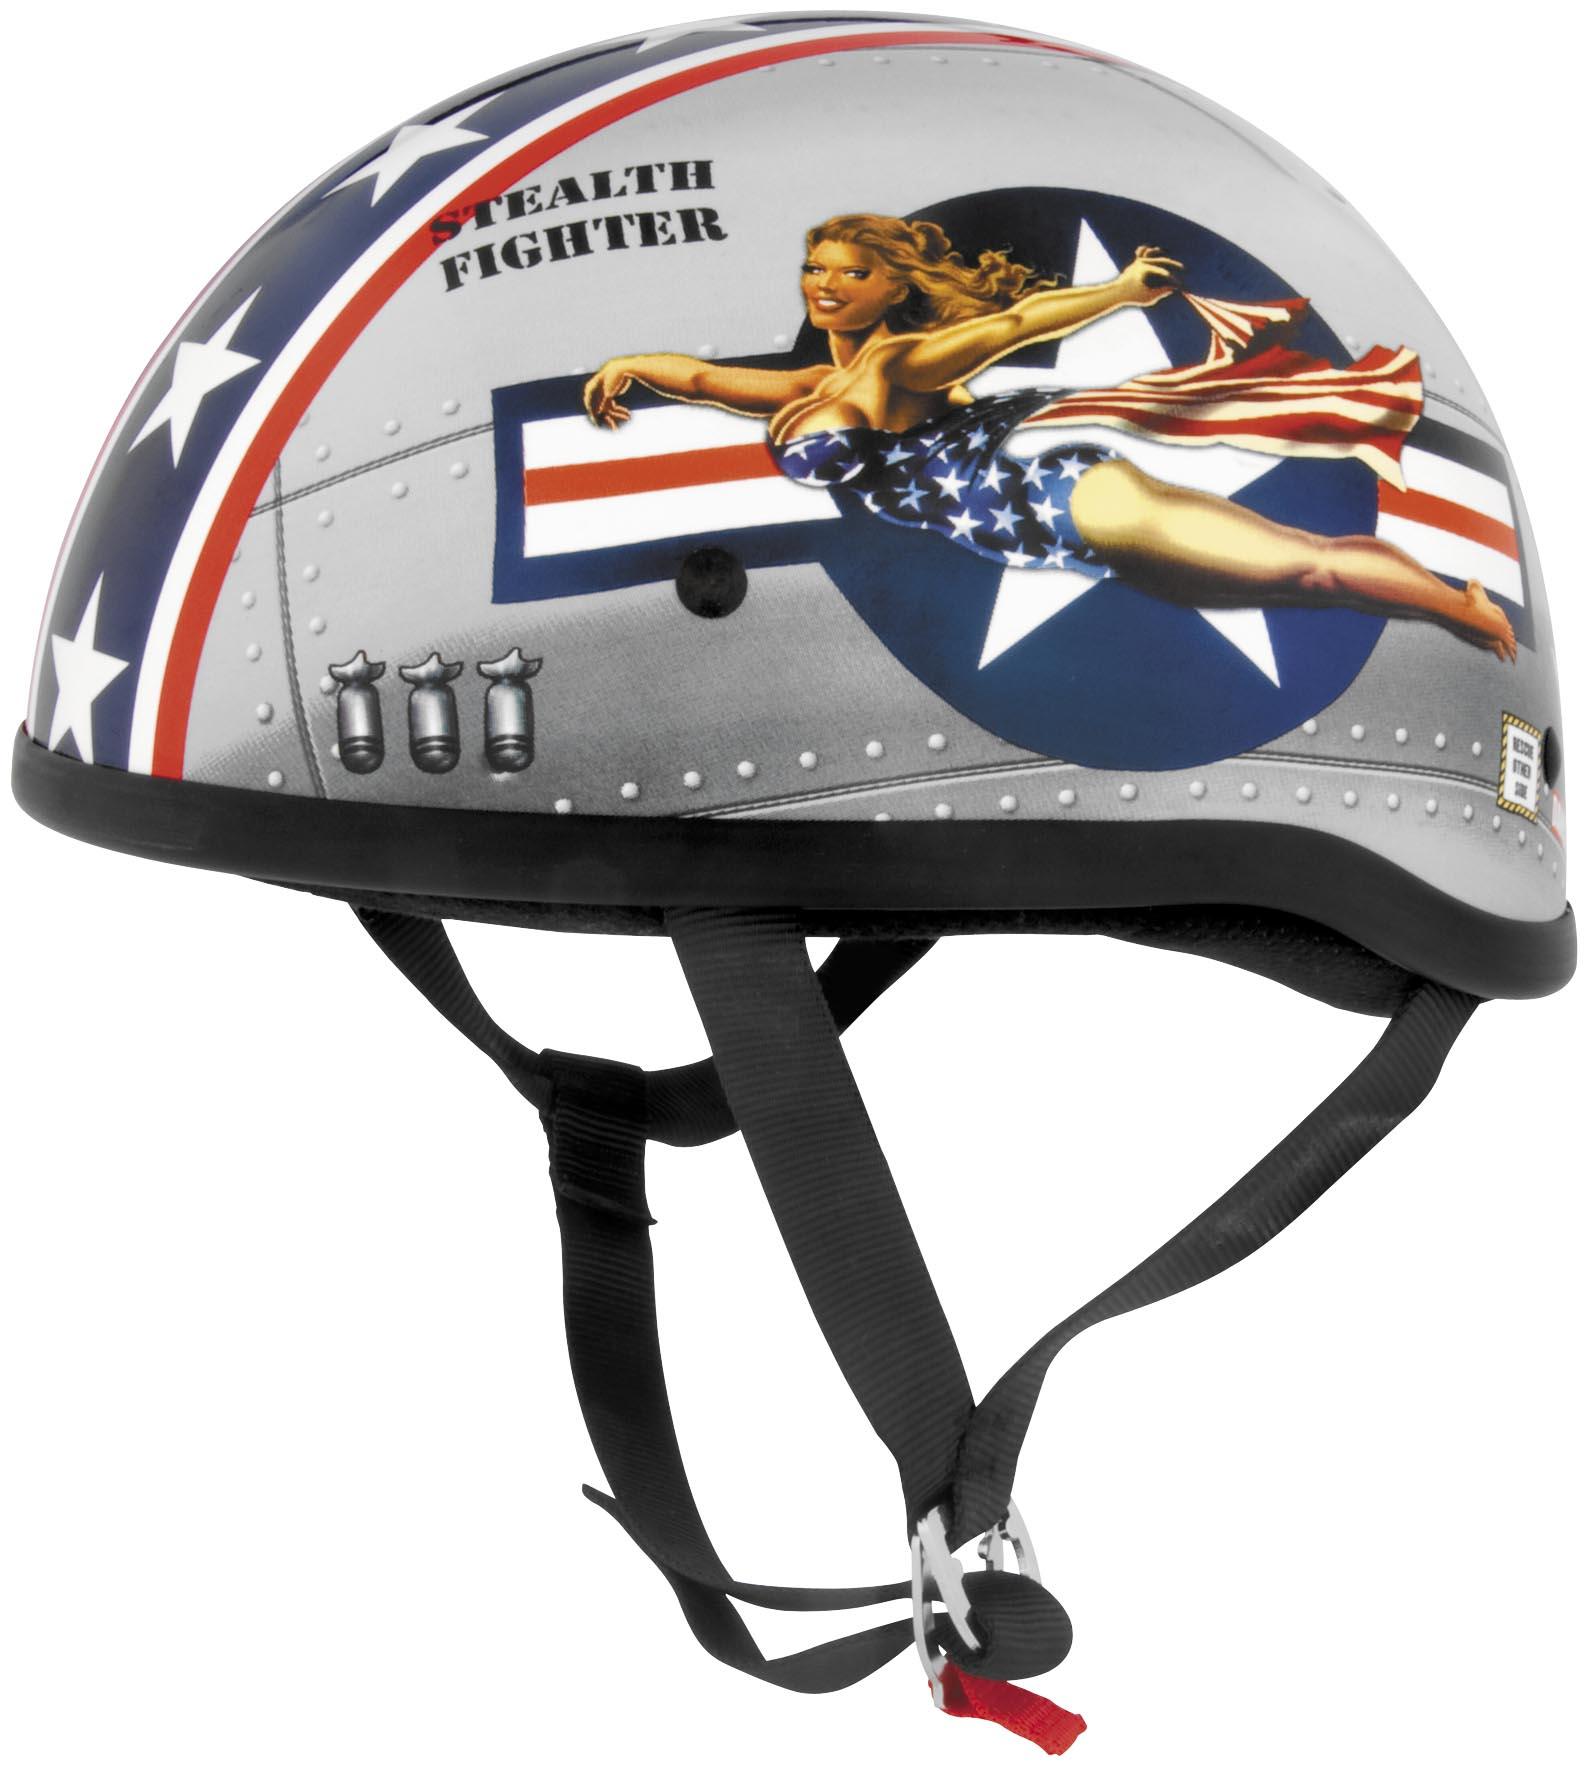 Original Bomber Pin Up Helmet